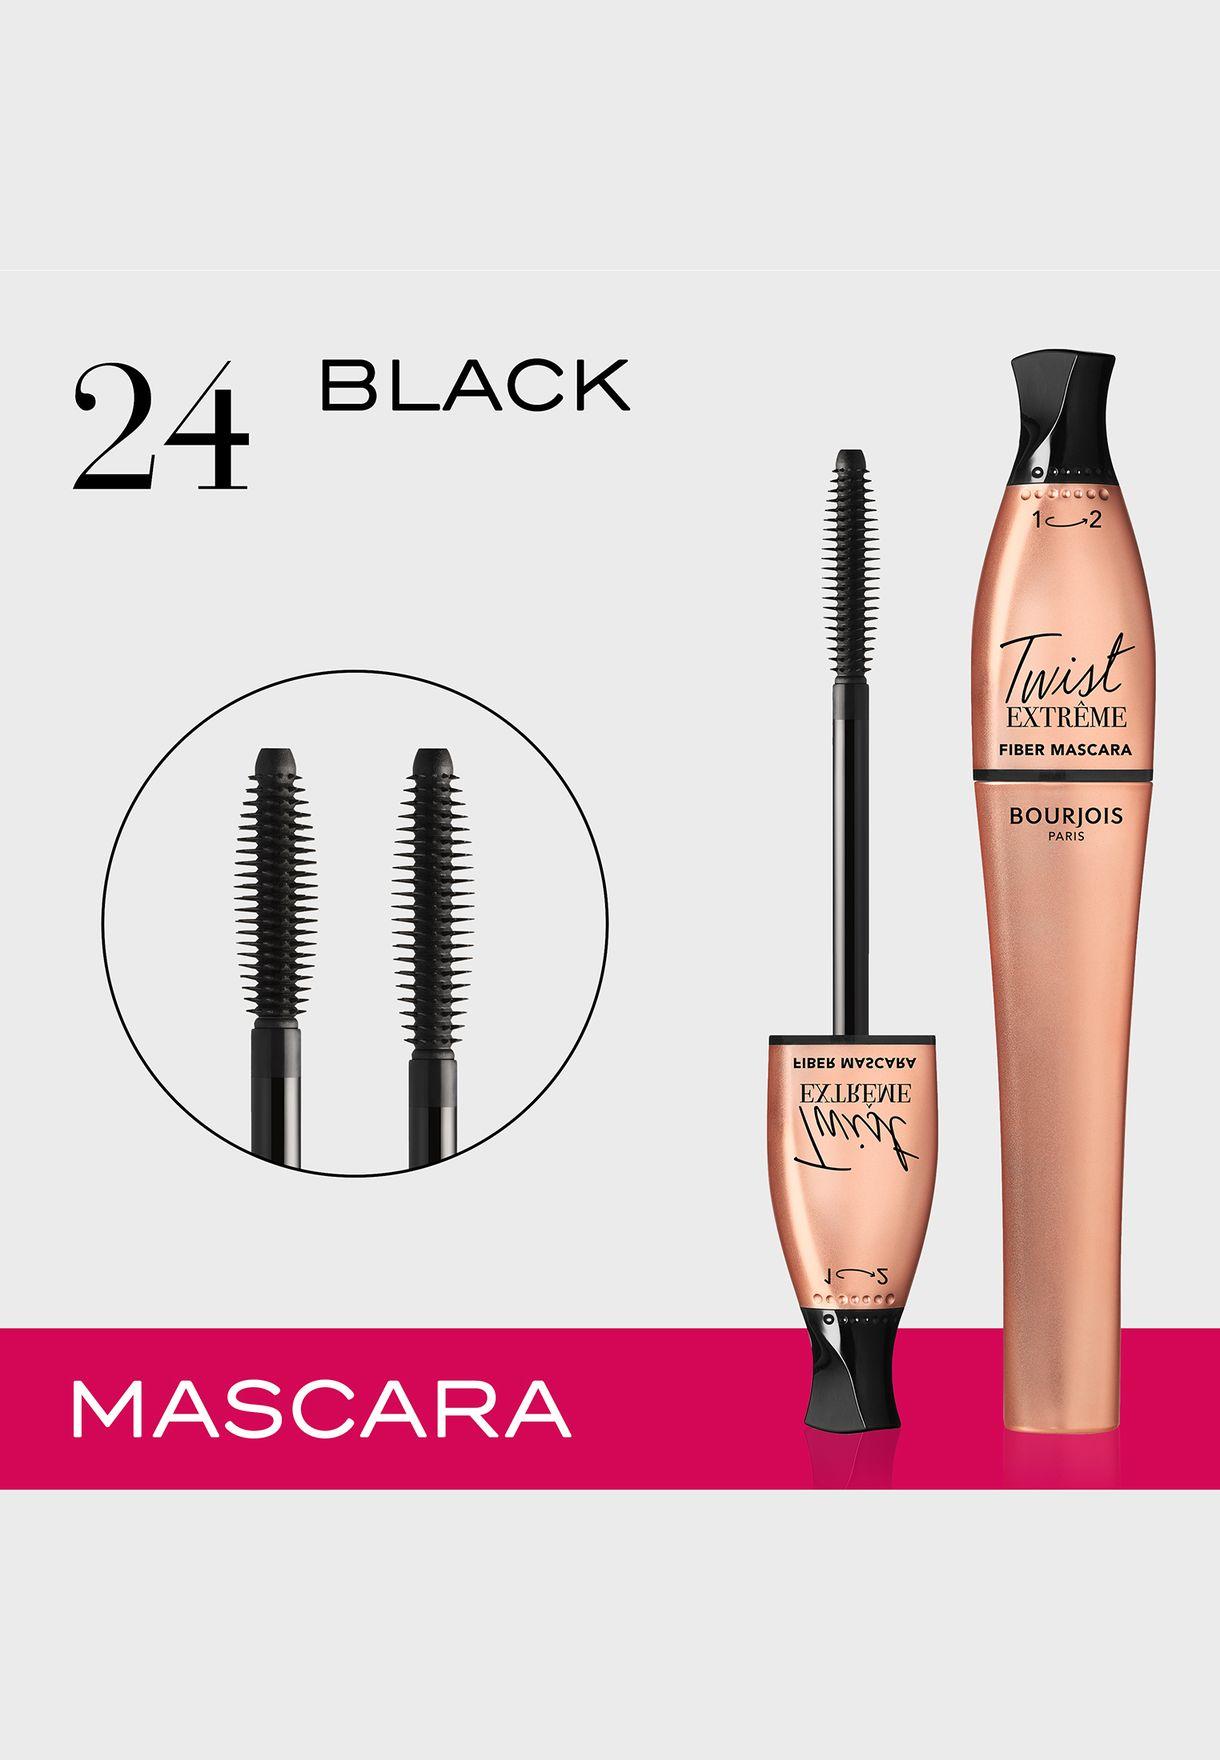 Twist Extreme Fiber Mascara 24 Black